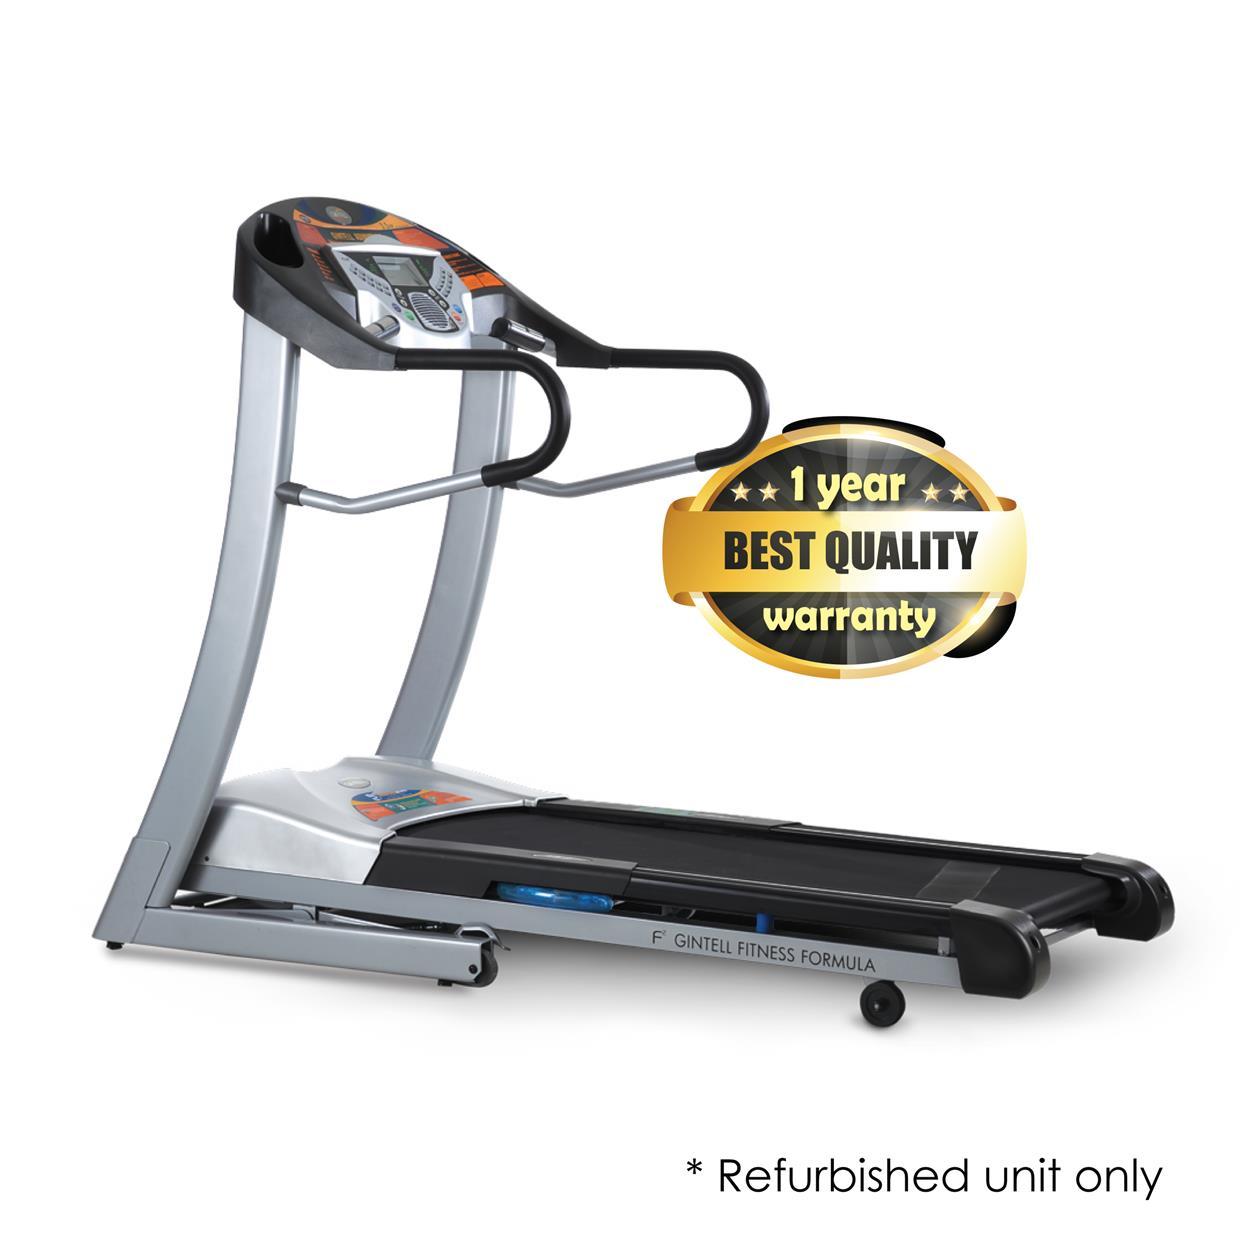 GINTELL FT22 CyberAIR Treadmill (Ref (end 1/3/2019 12:15 PM